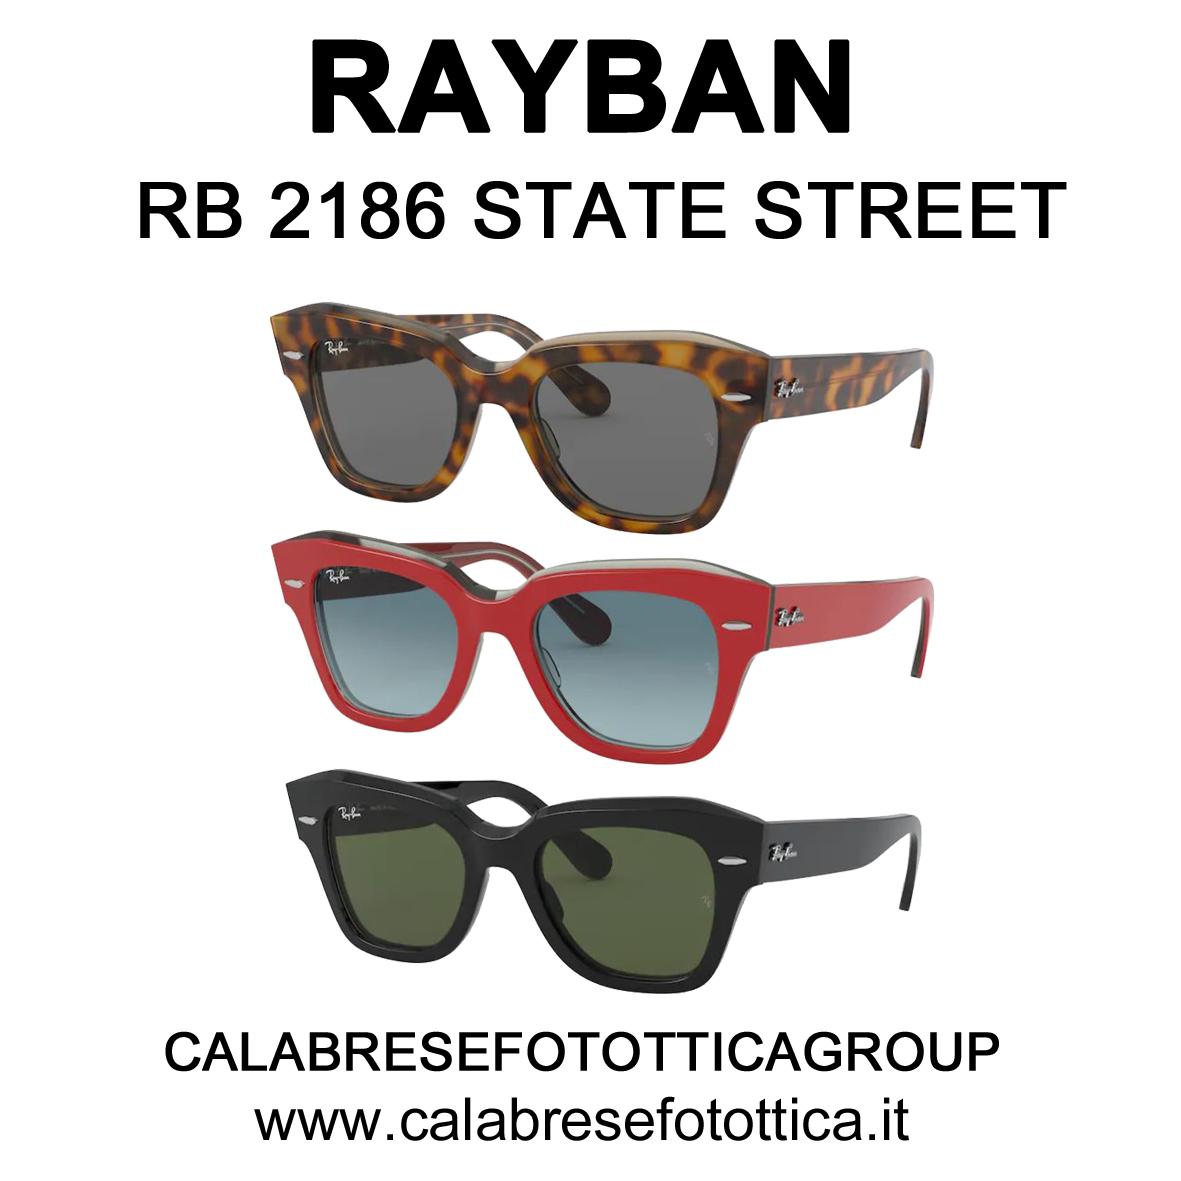 RAYBAN SOLE RB 2186 STATE STREET DA PHOTO + OPTICAL VIA CALZOLERIE 1/E BOLOGNA CENTRO QUADRILATERO